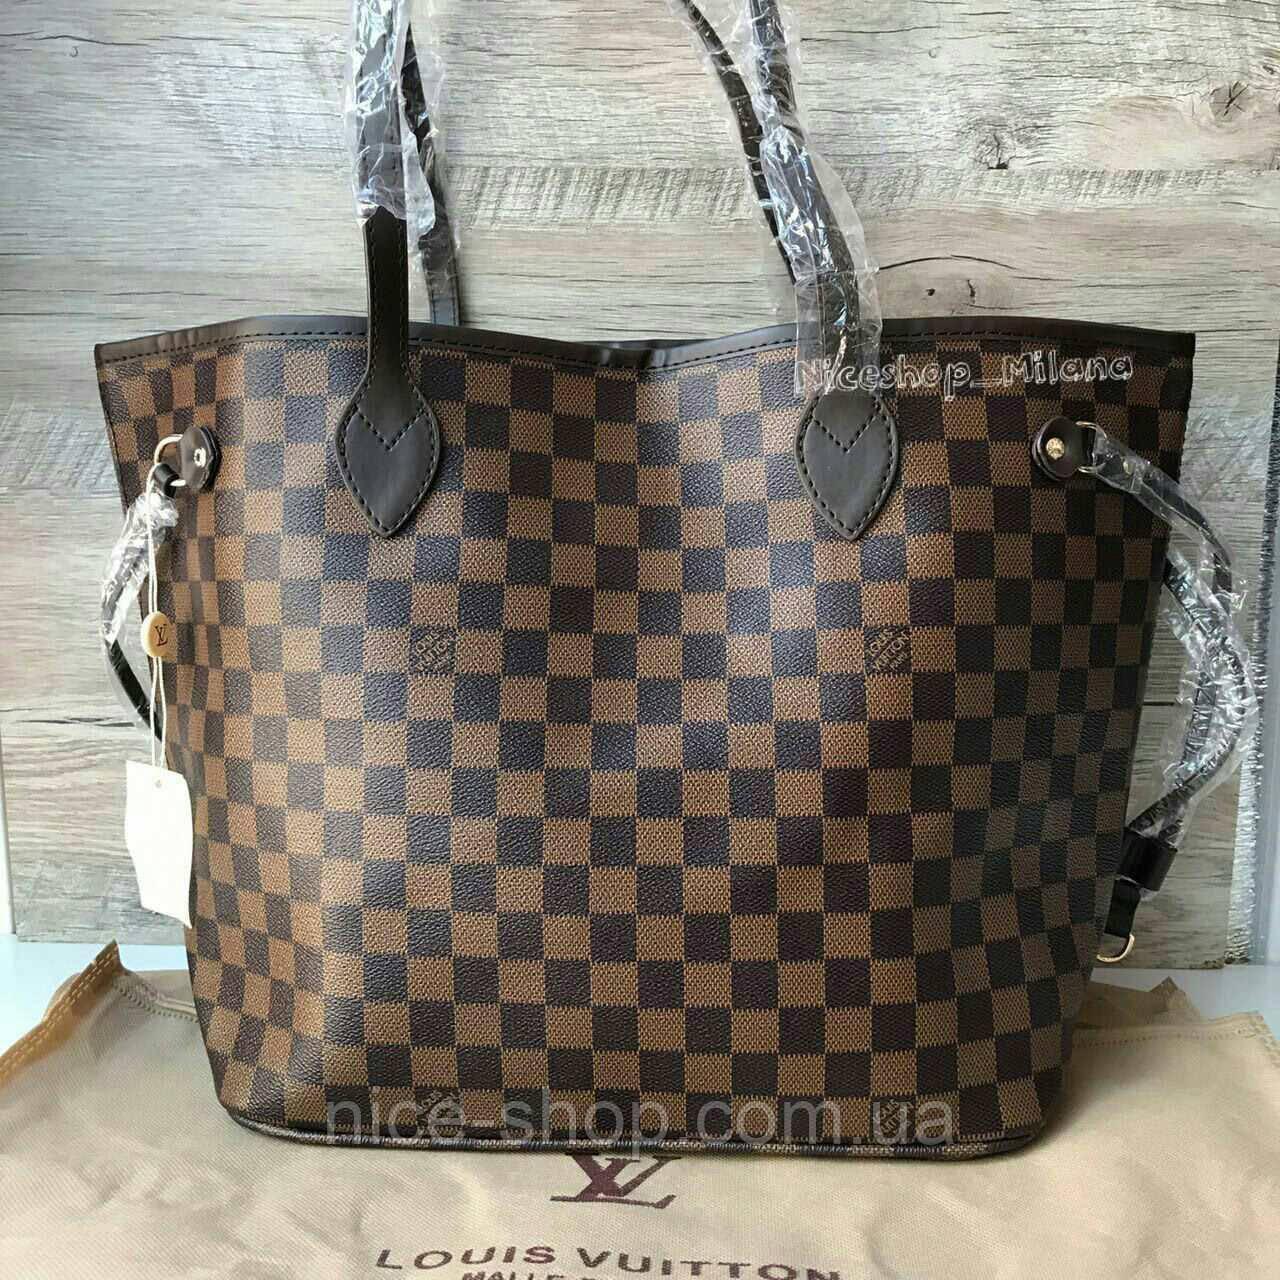 97aa68e00216 Сумка Louis Vuitton Neverfull Large коричневая в клетку: продажа ...